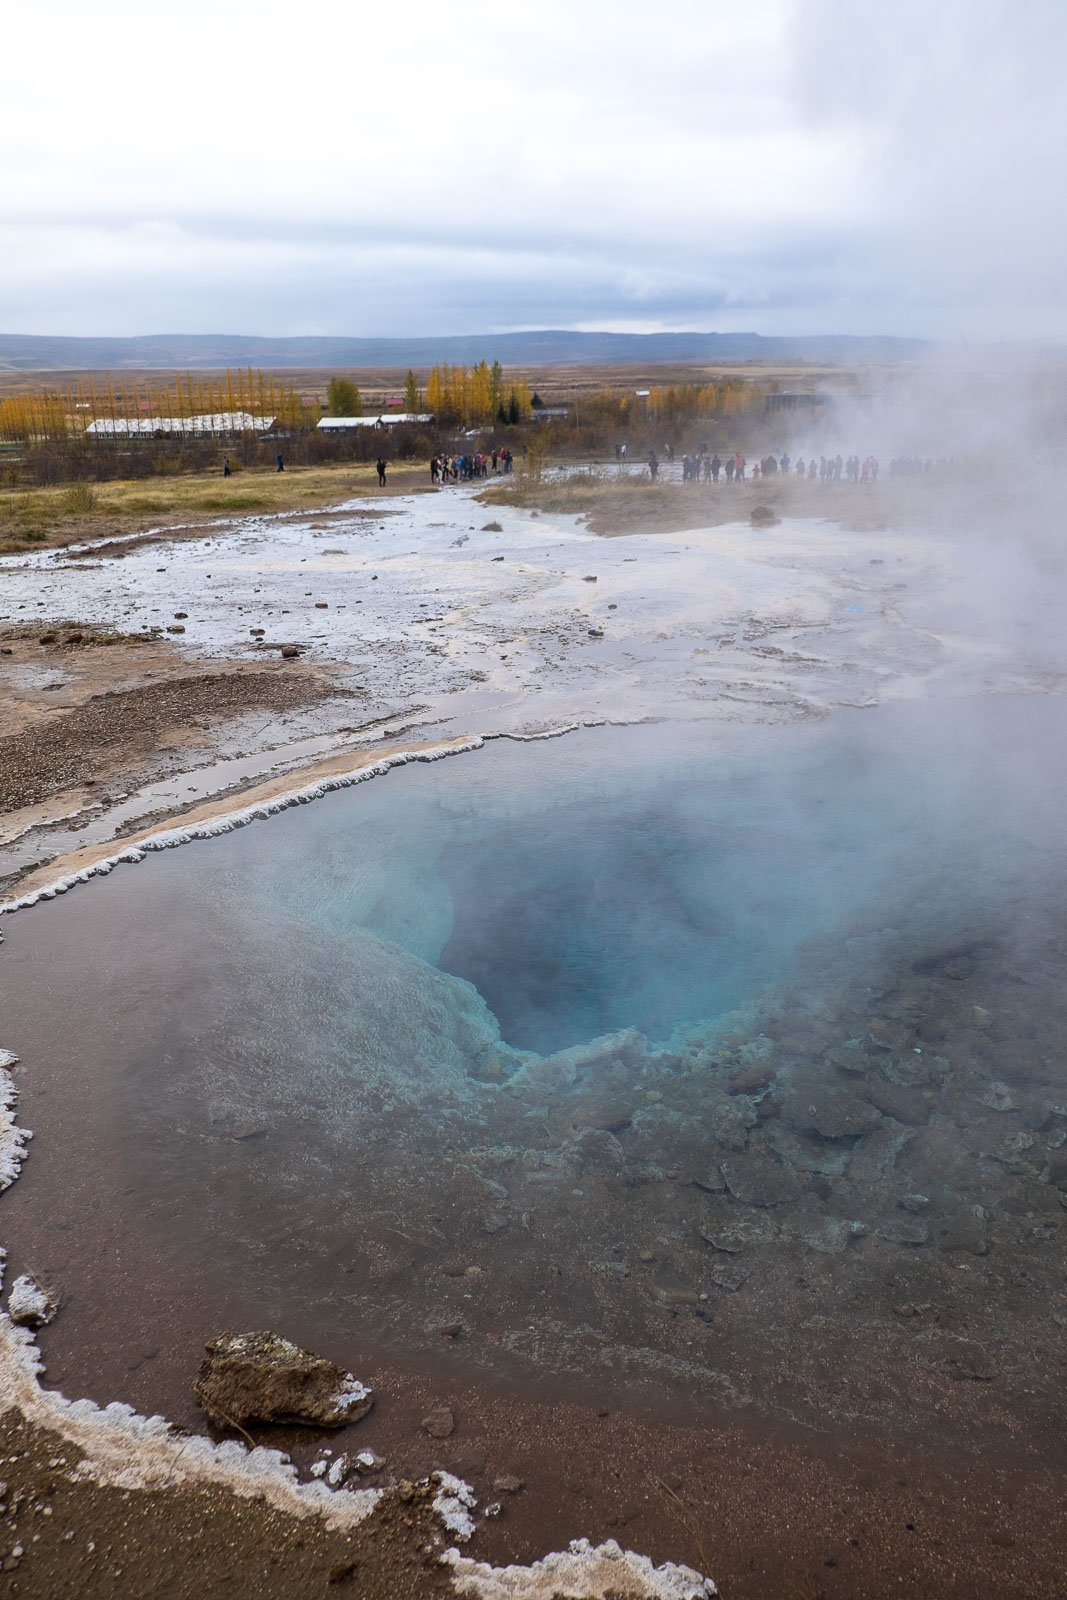 Rachel Off Duty: Road Trip Down Iceland's Golden Circle Loop